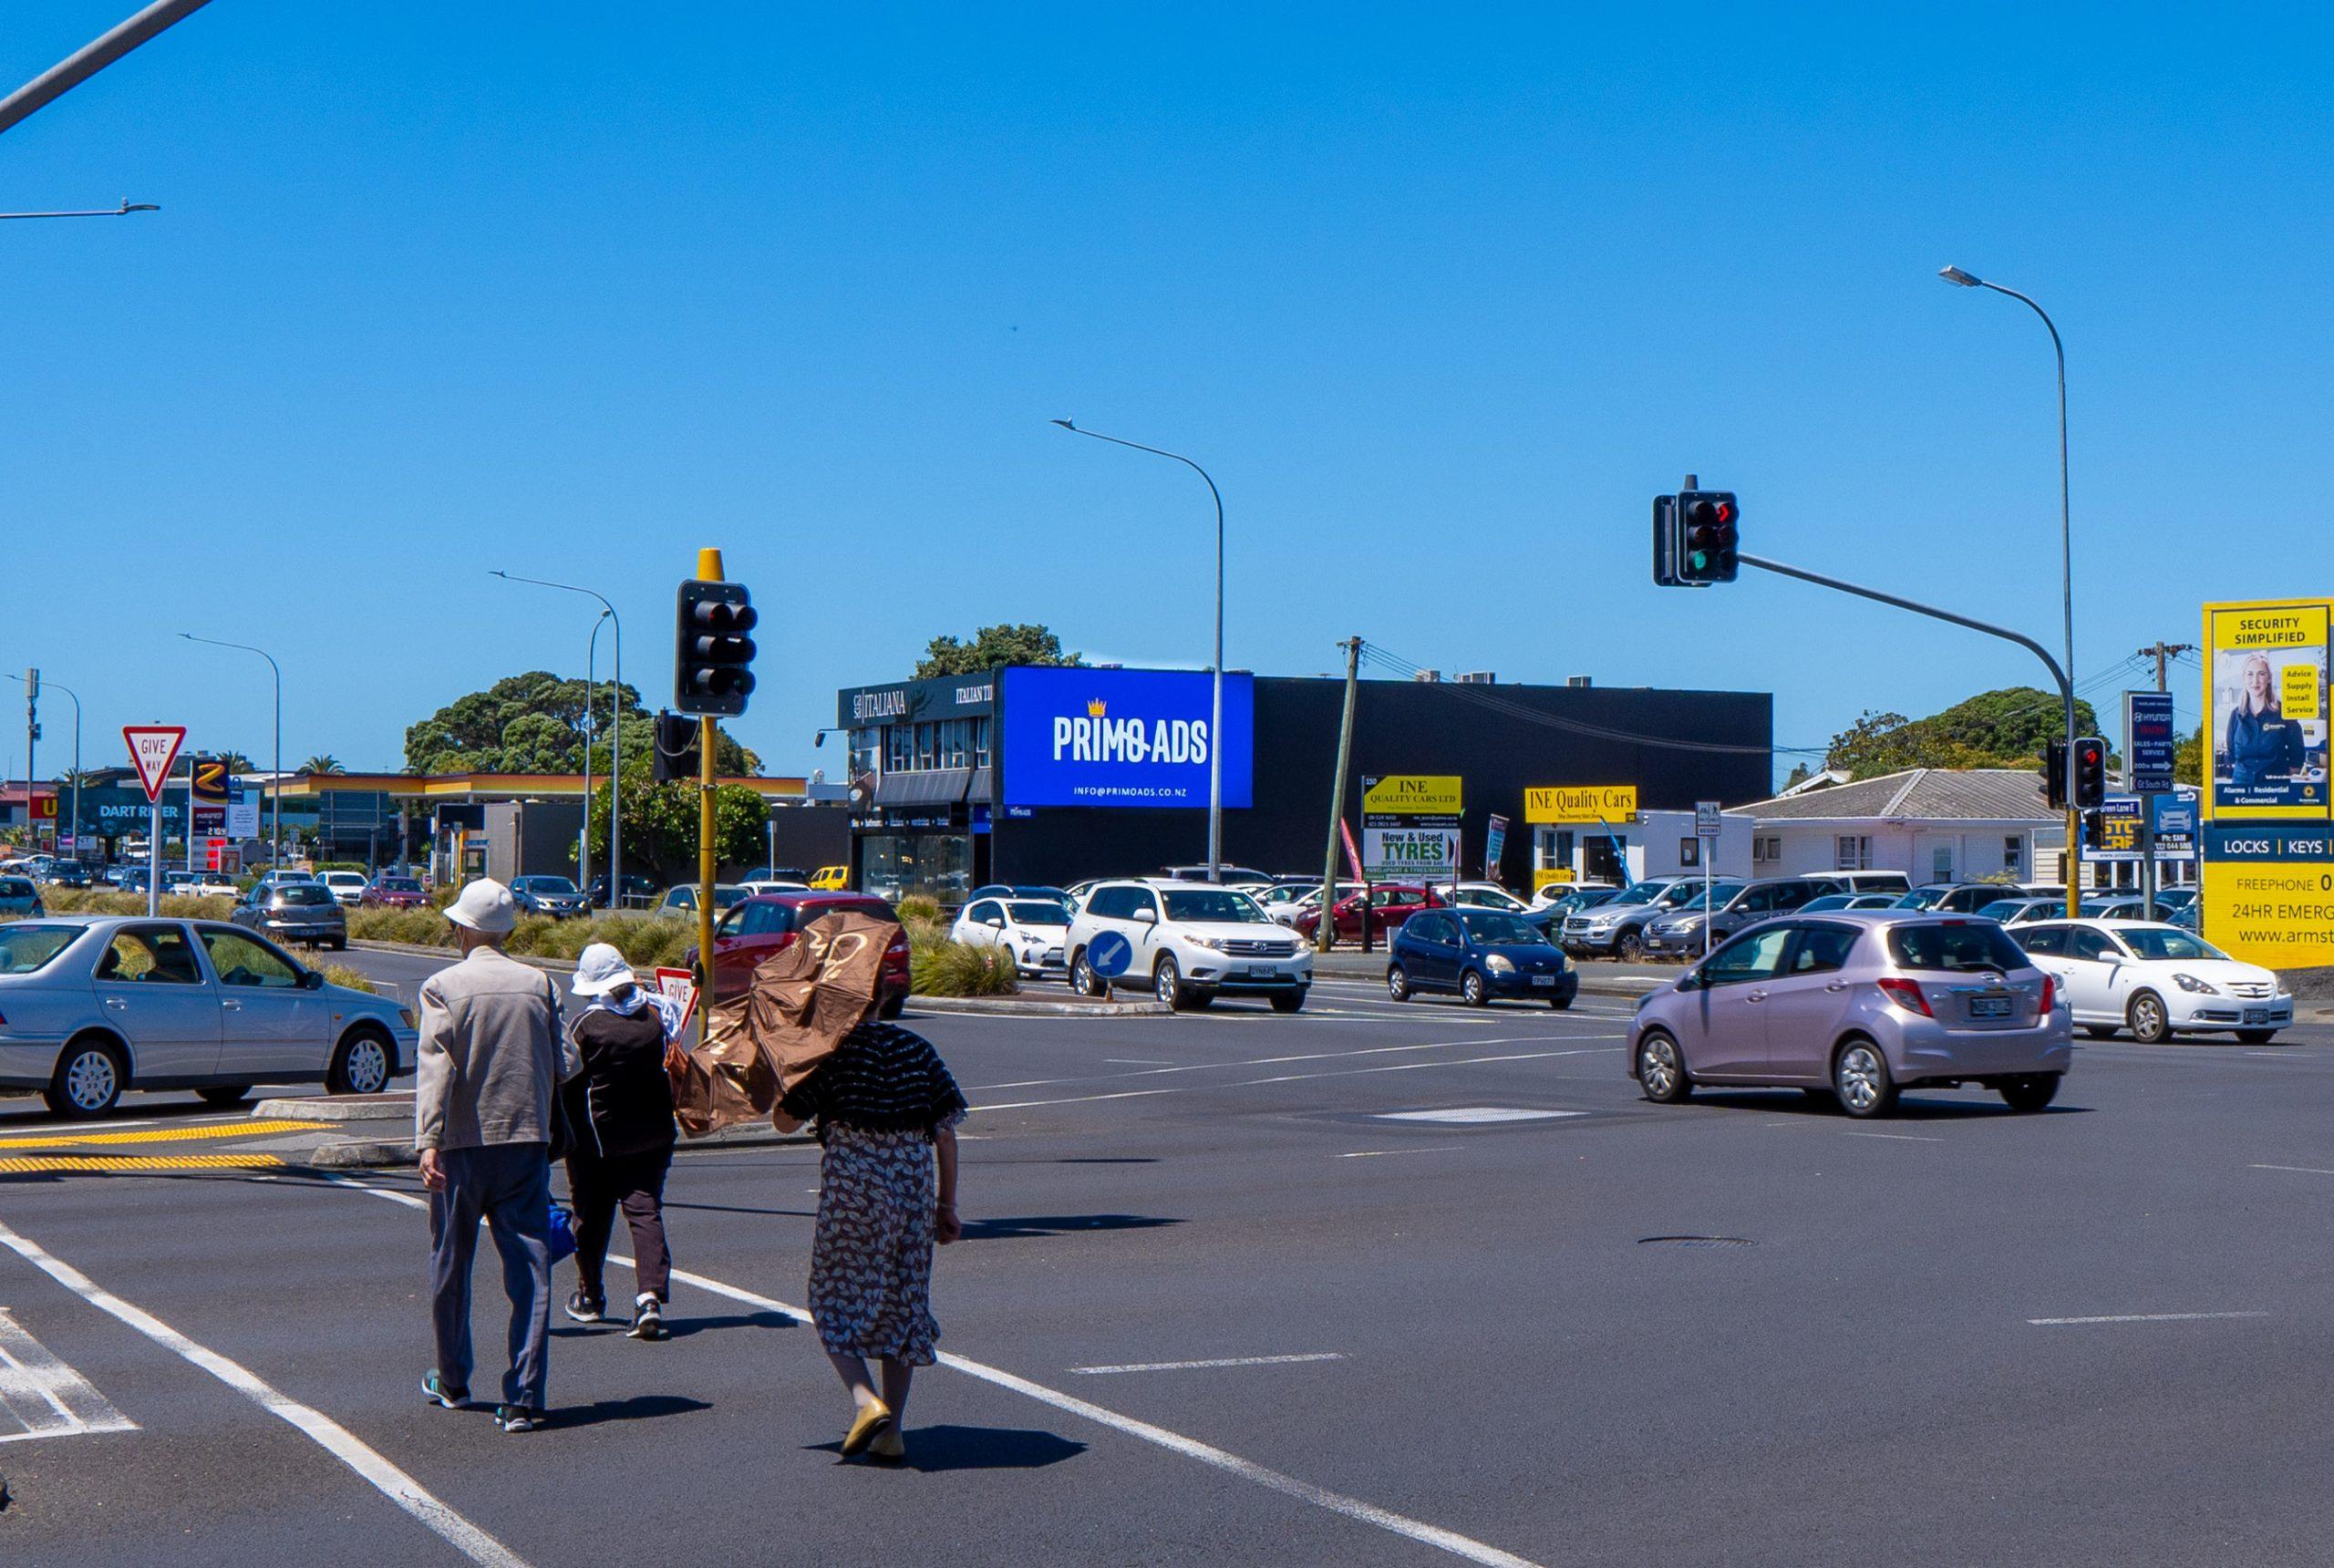 Greenlane Billboard Intersection